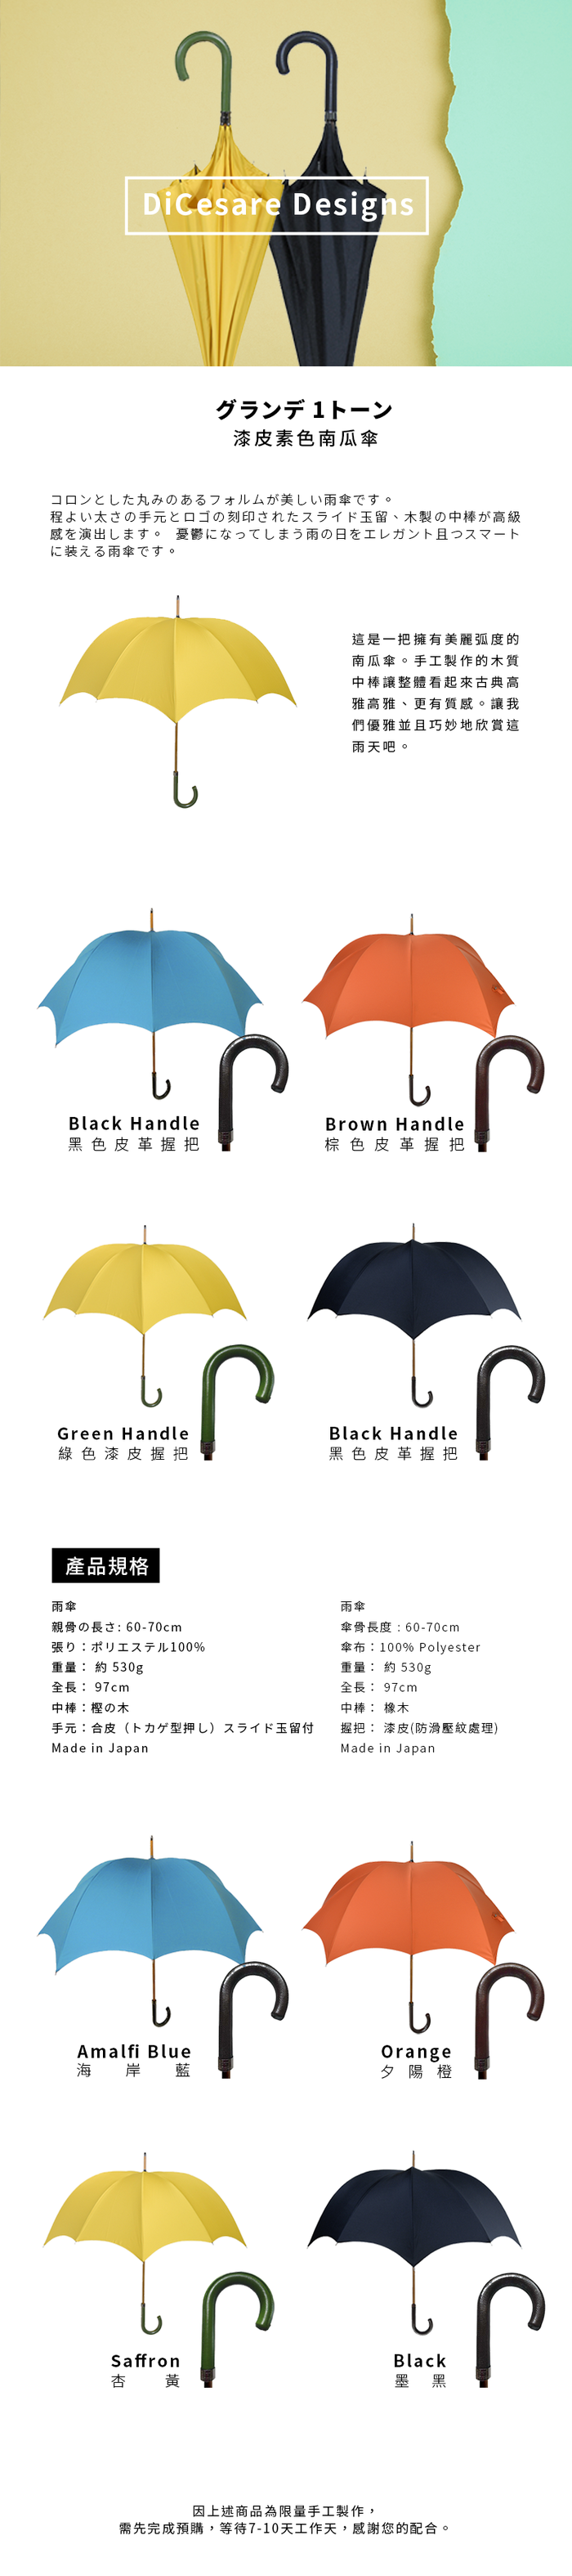 DiCesare|GRANDE 1tone 漆皮素色南瓜傘-墨黑(黑色皮革握把)